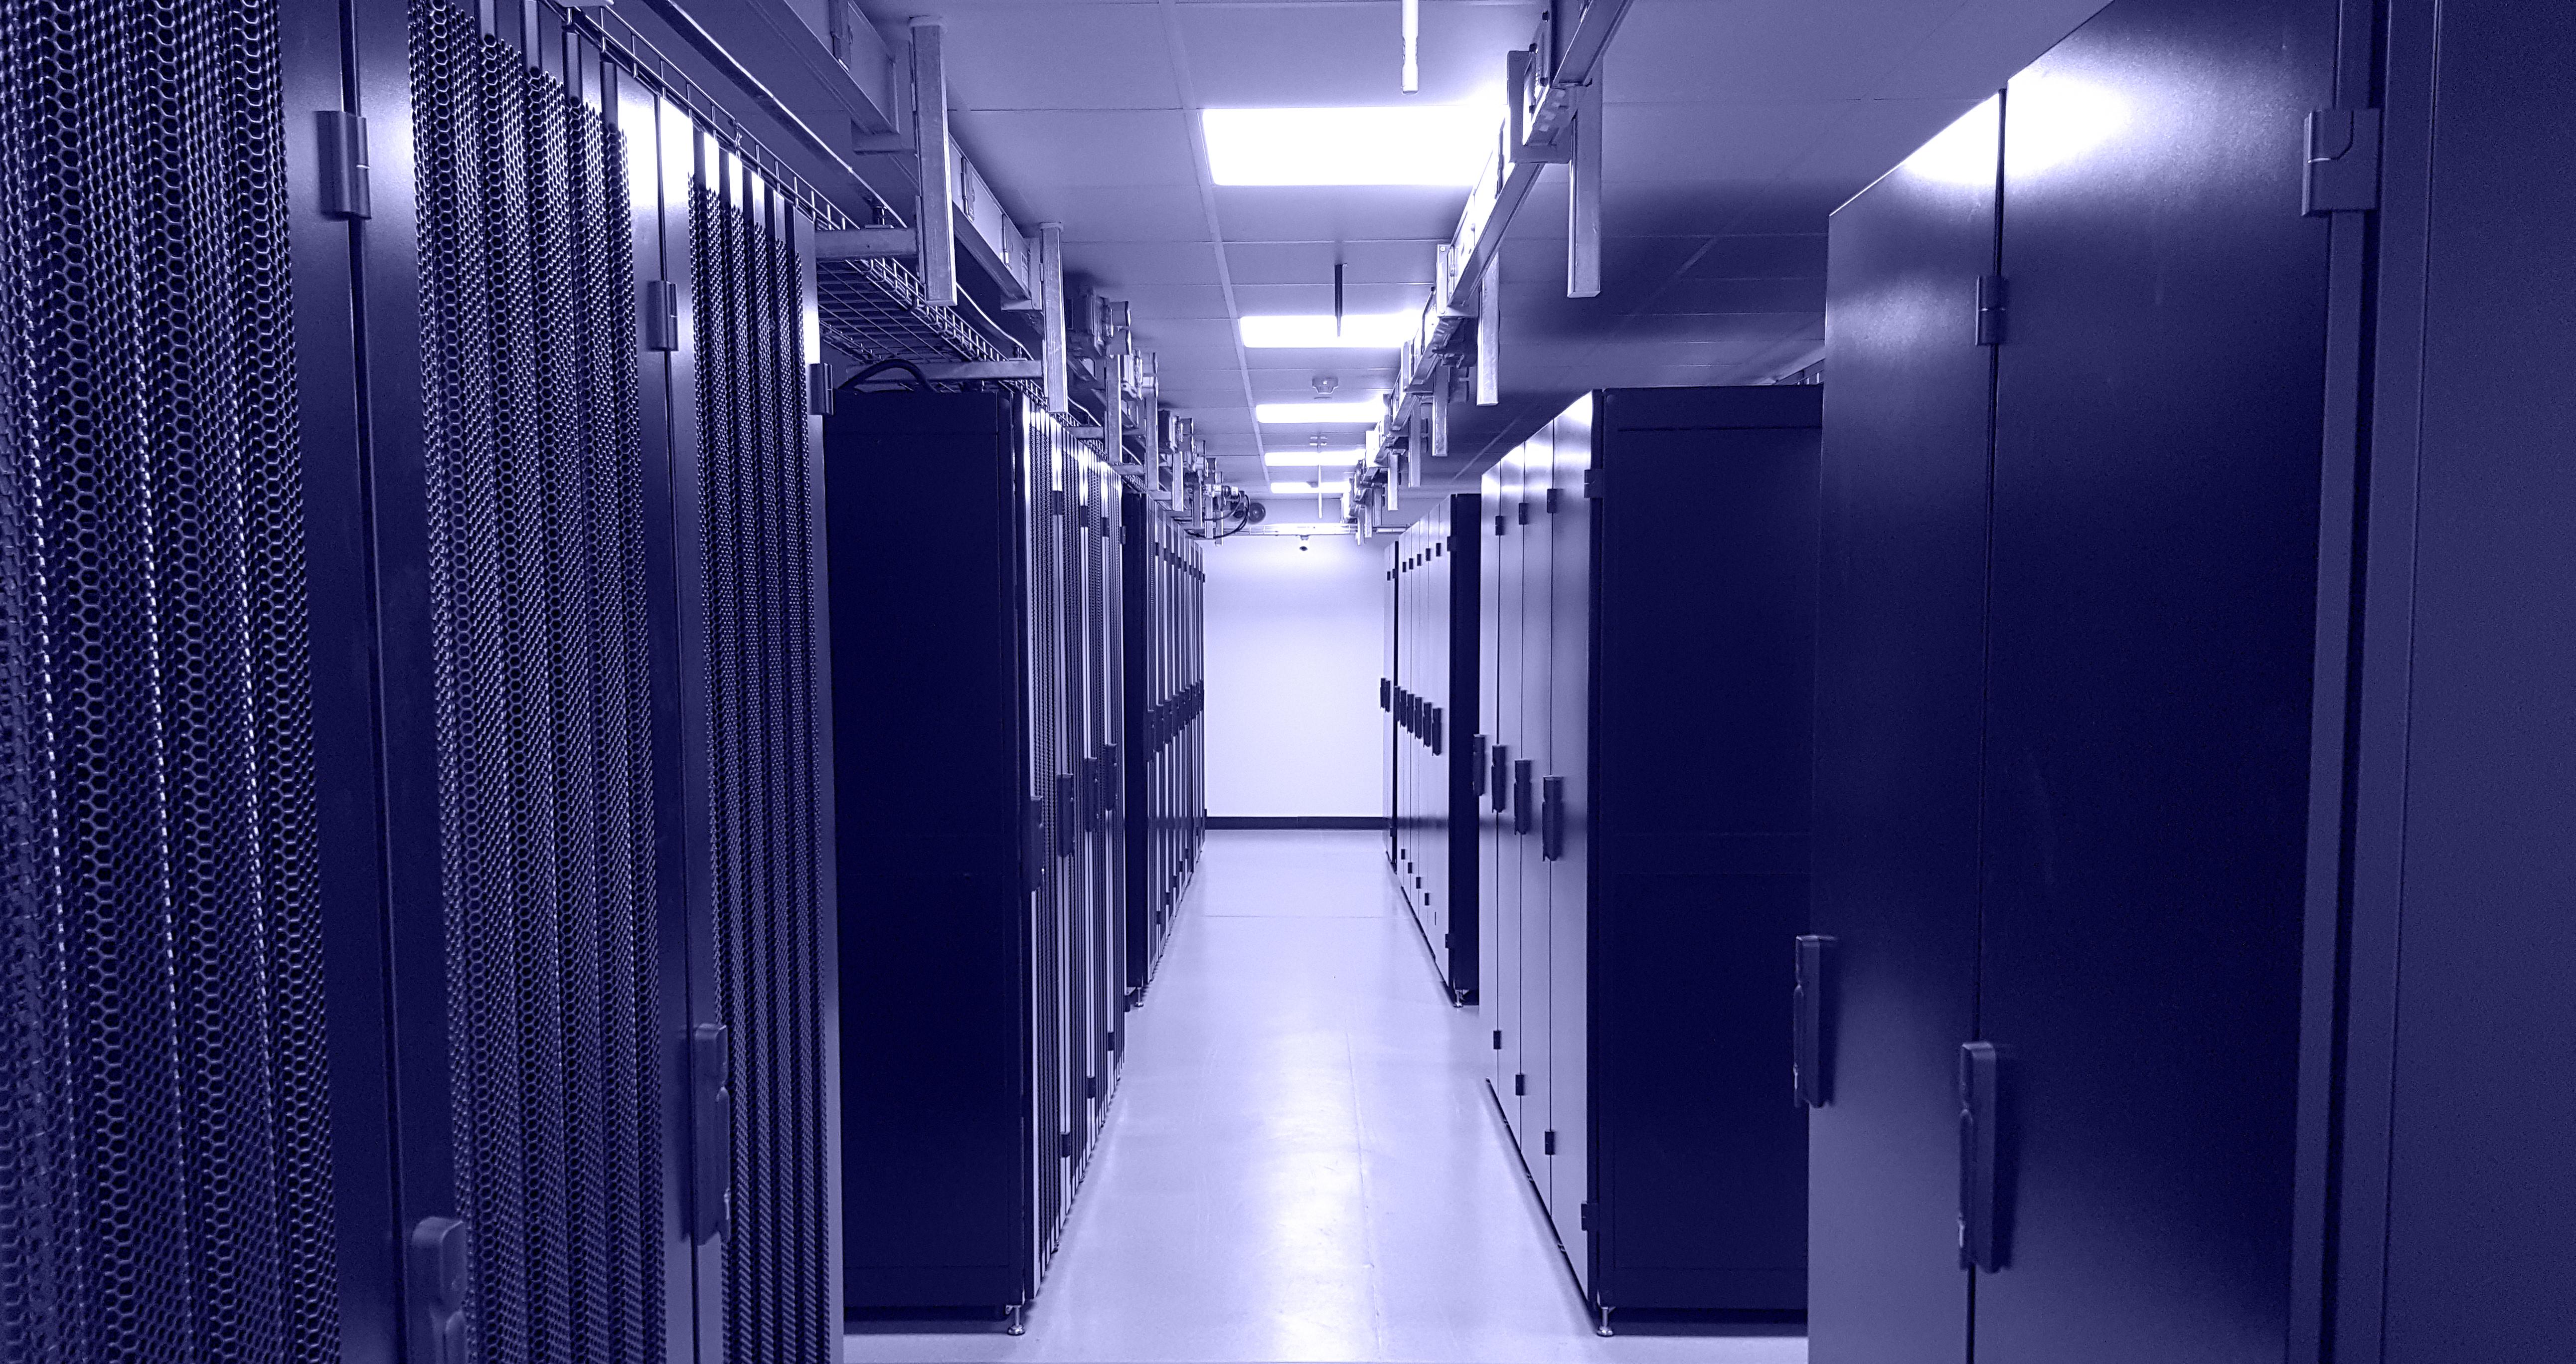 Mac High Sierra - Telnet and FTP Missing? | PeteNetLive